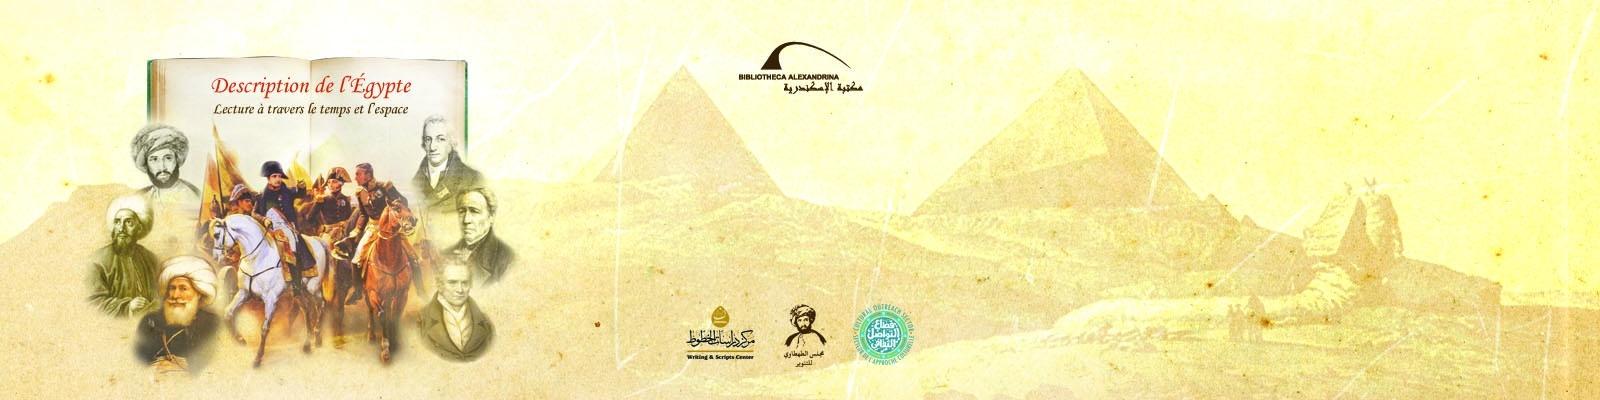 """<i>Description De l'Egypte</i> .. A Reading through Time and Place"""